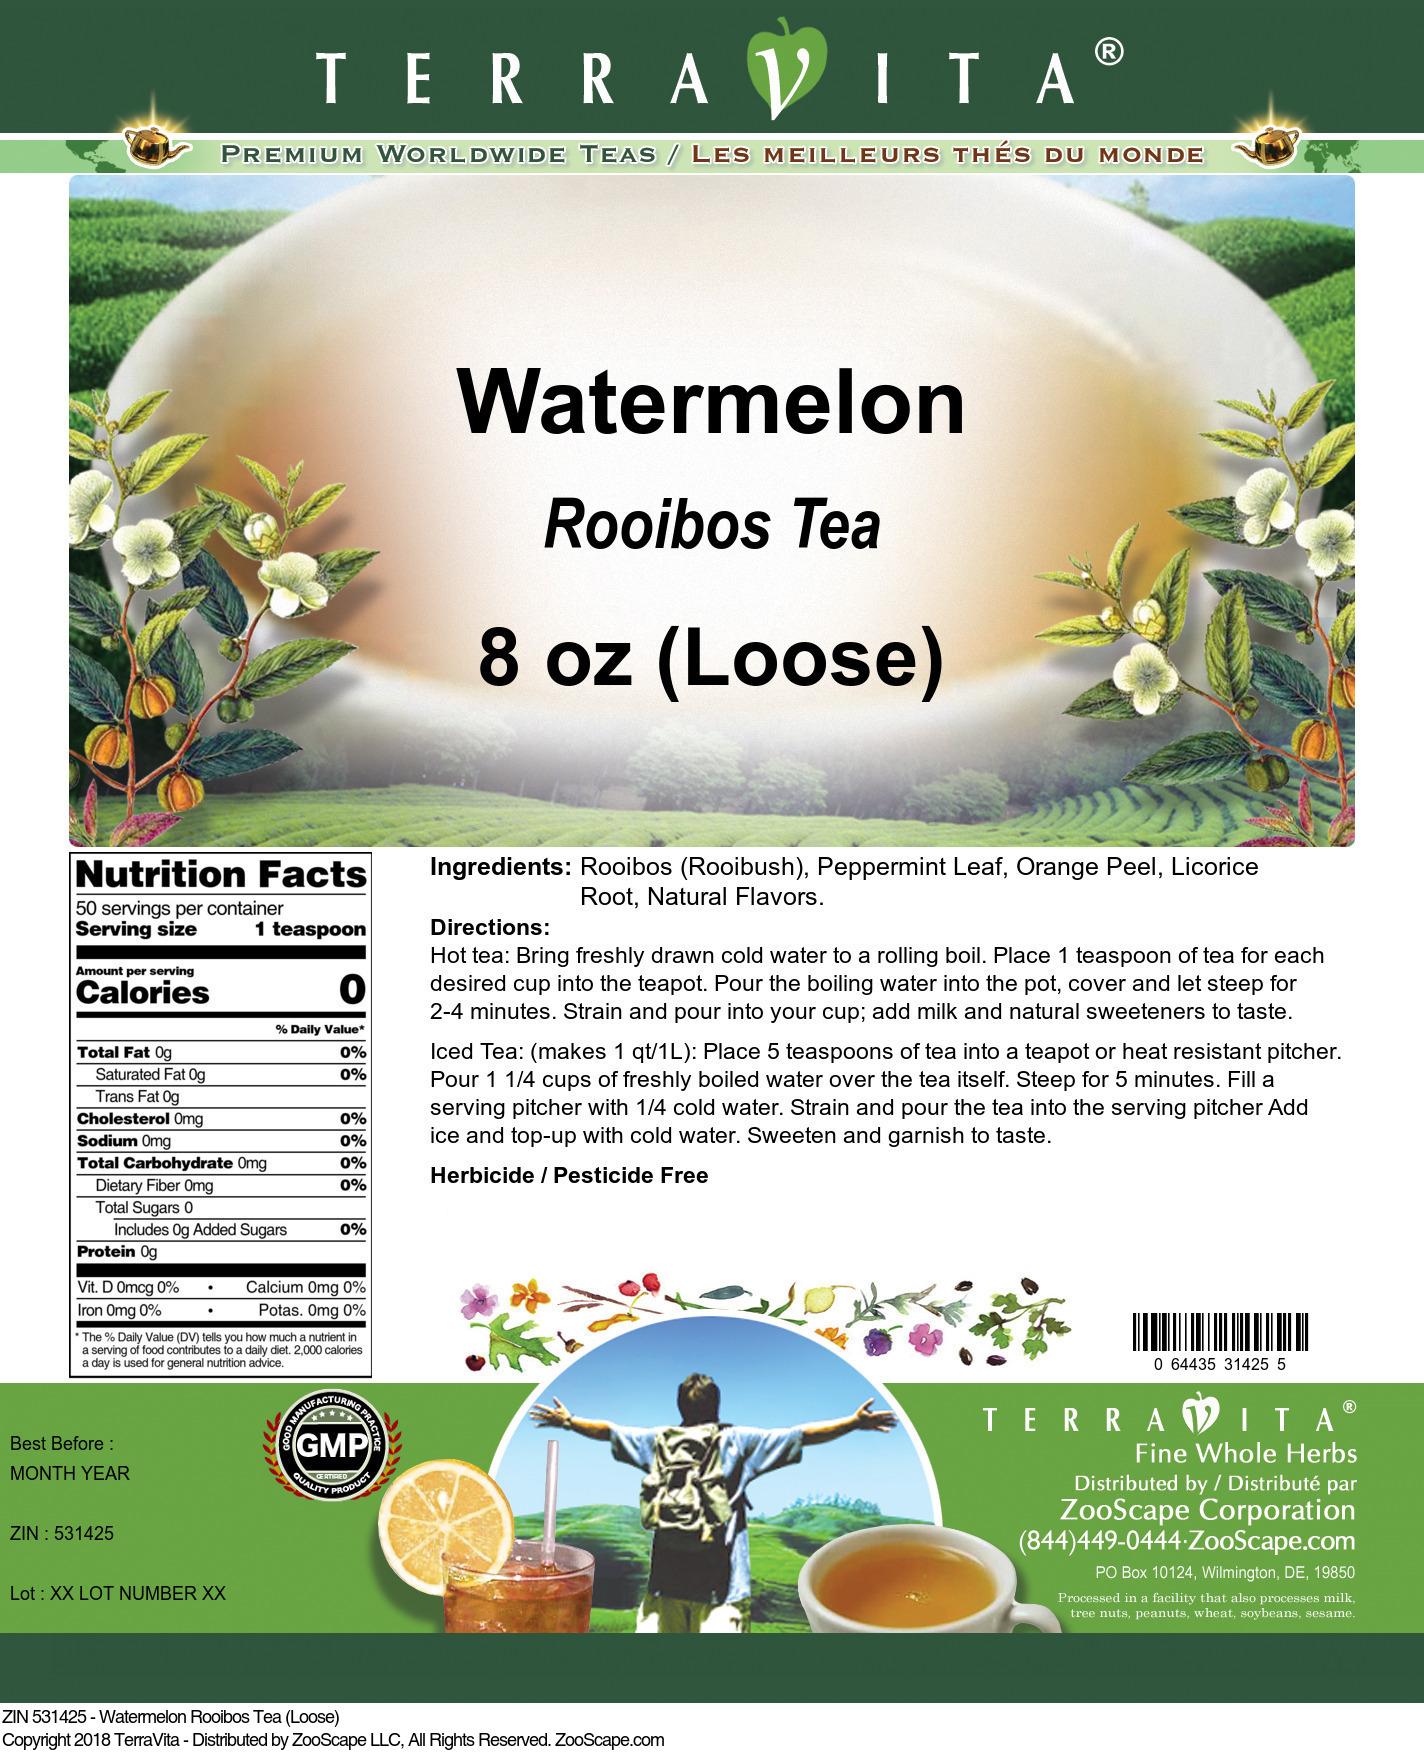 Watermelon Rooibos Tea